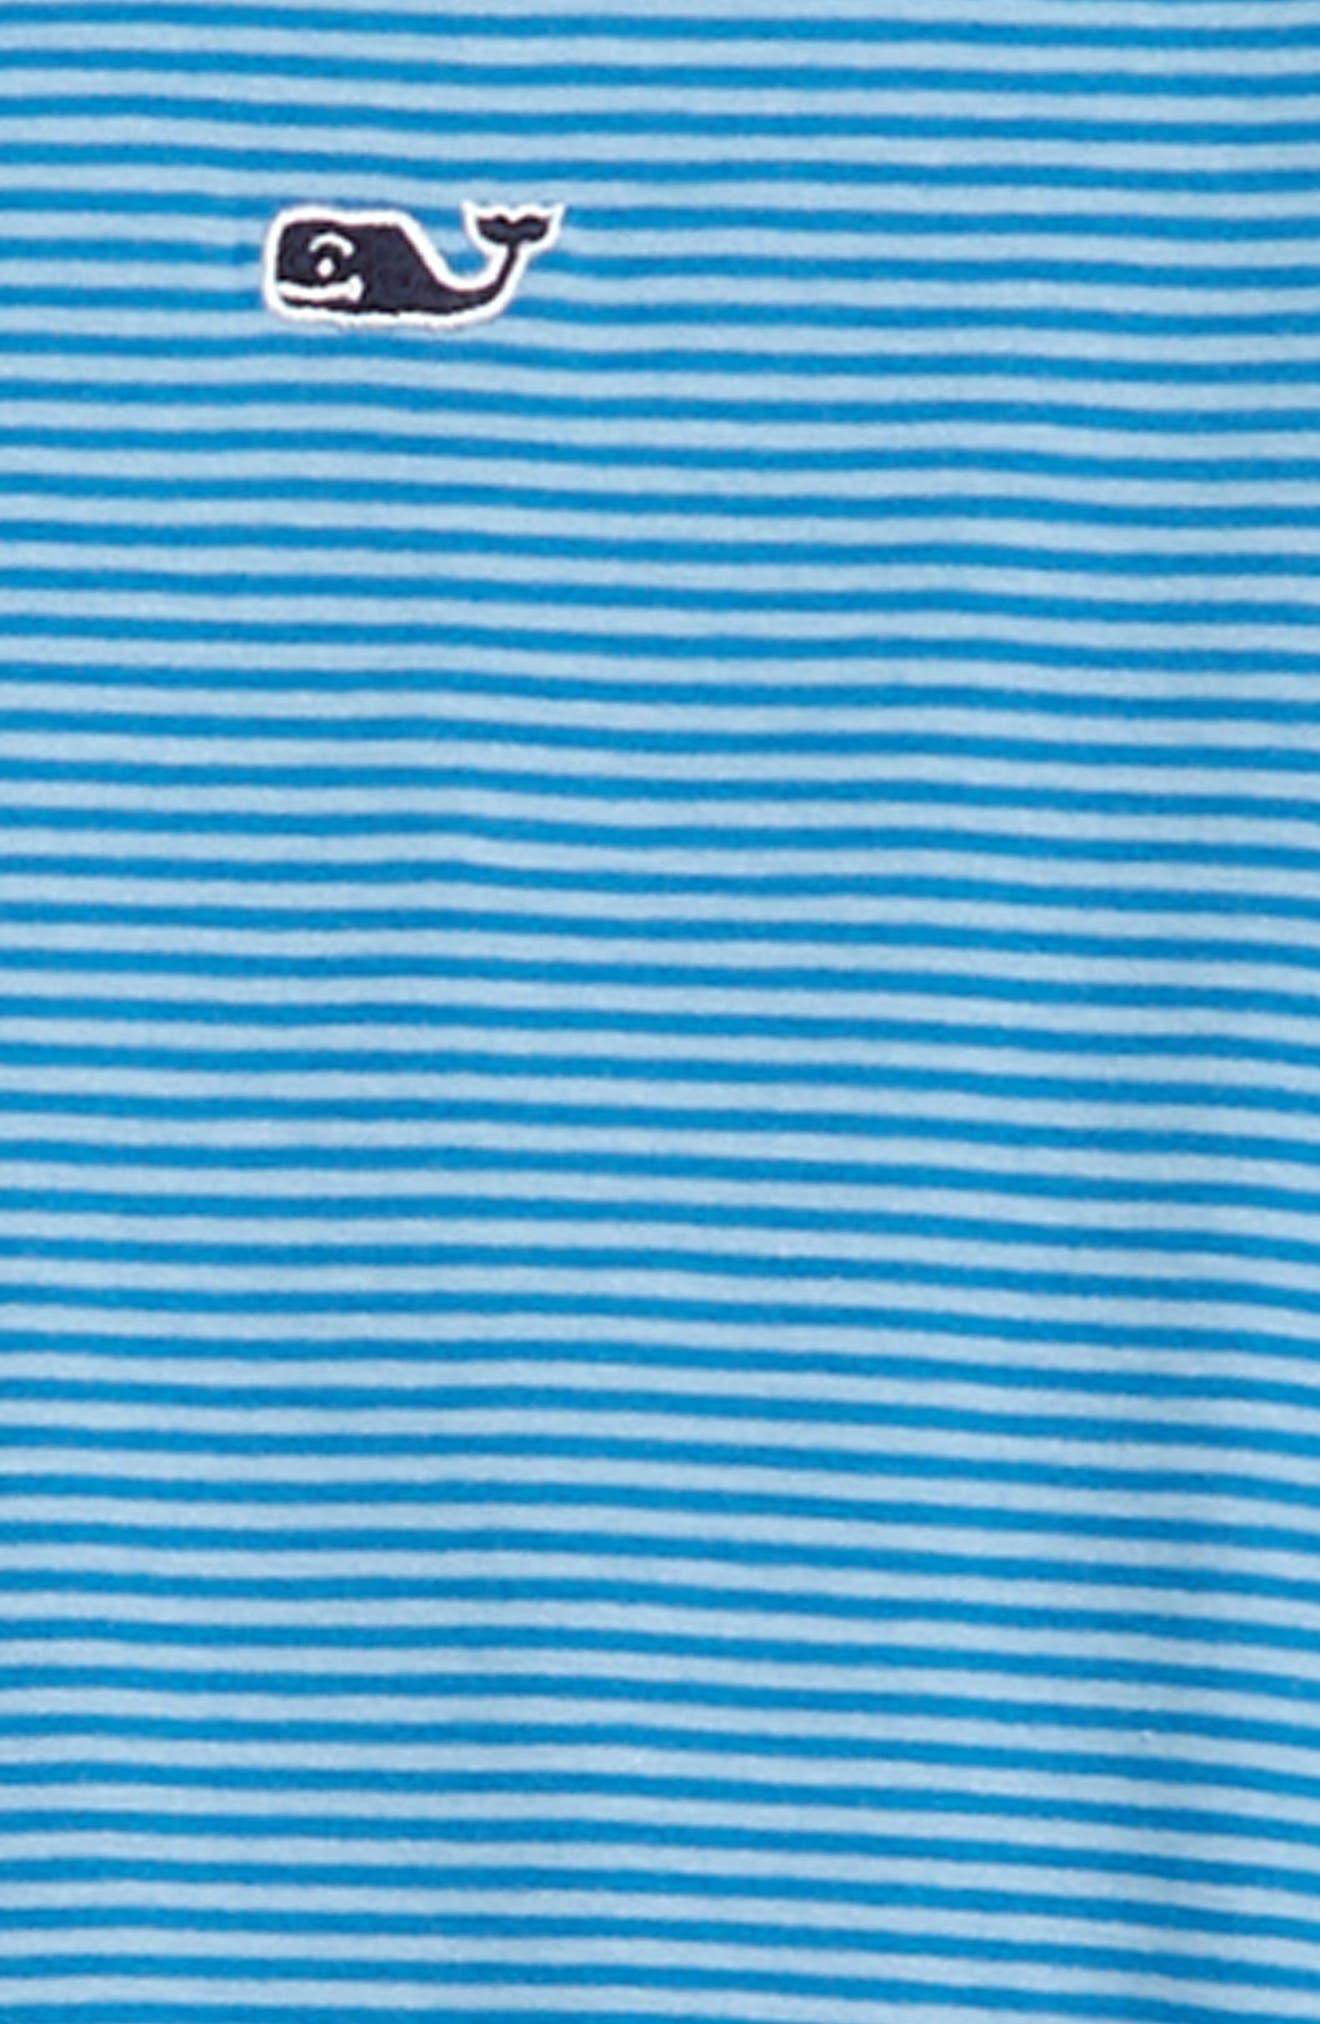 Stripe Edgartown Performance Polo,                             Alternate thumbnail 2, color,                             456